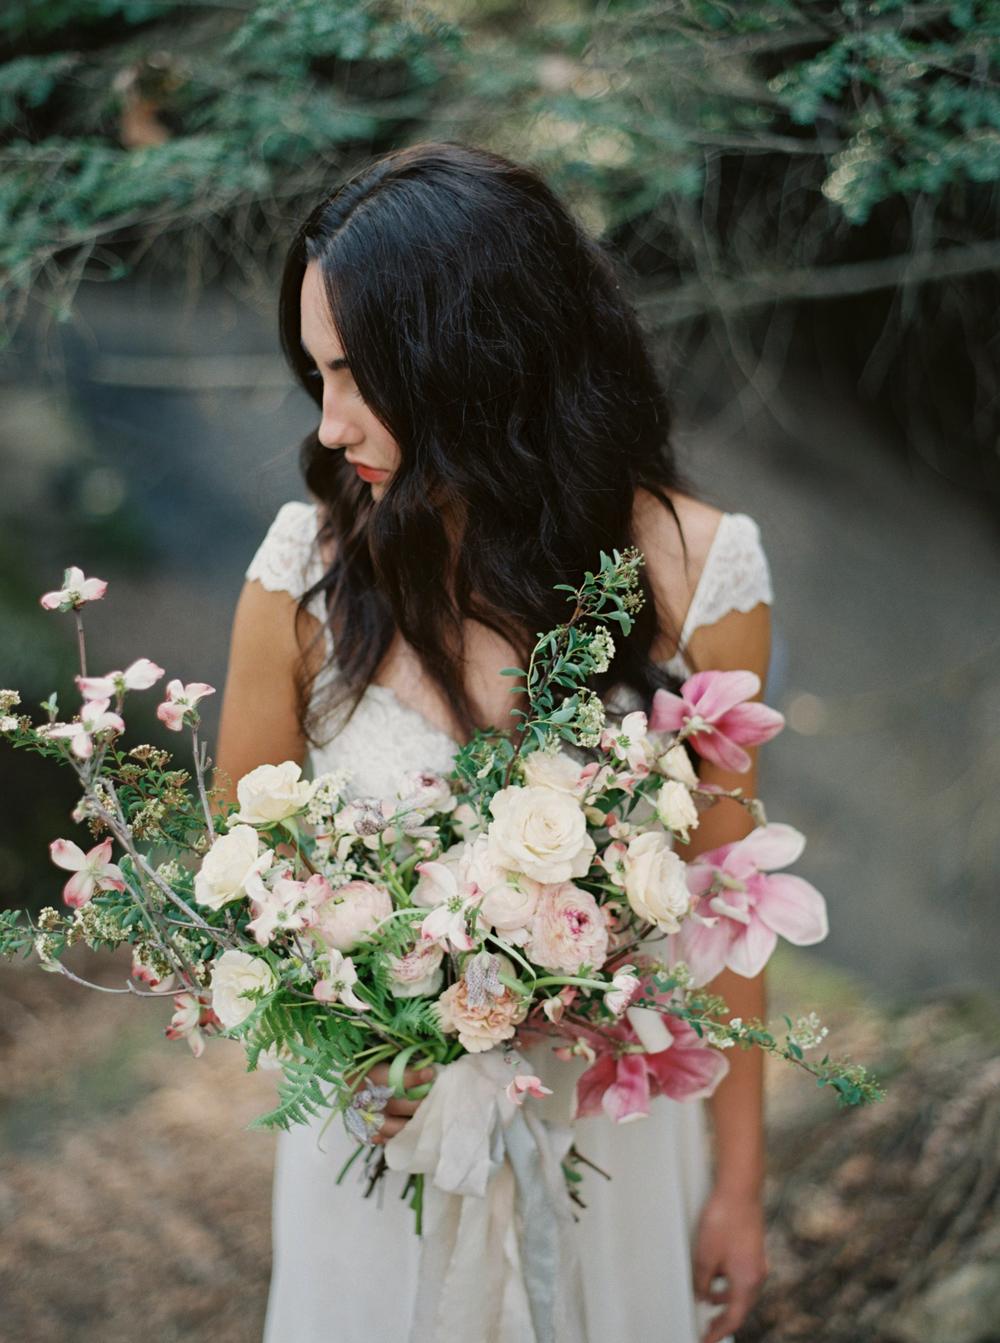 Kyle John l Fine Art Wedding Photography l Chicago, Copenhagen, California, New York, Destination l Blog l AK_18